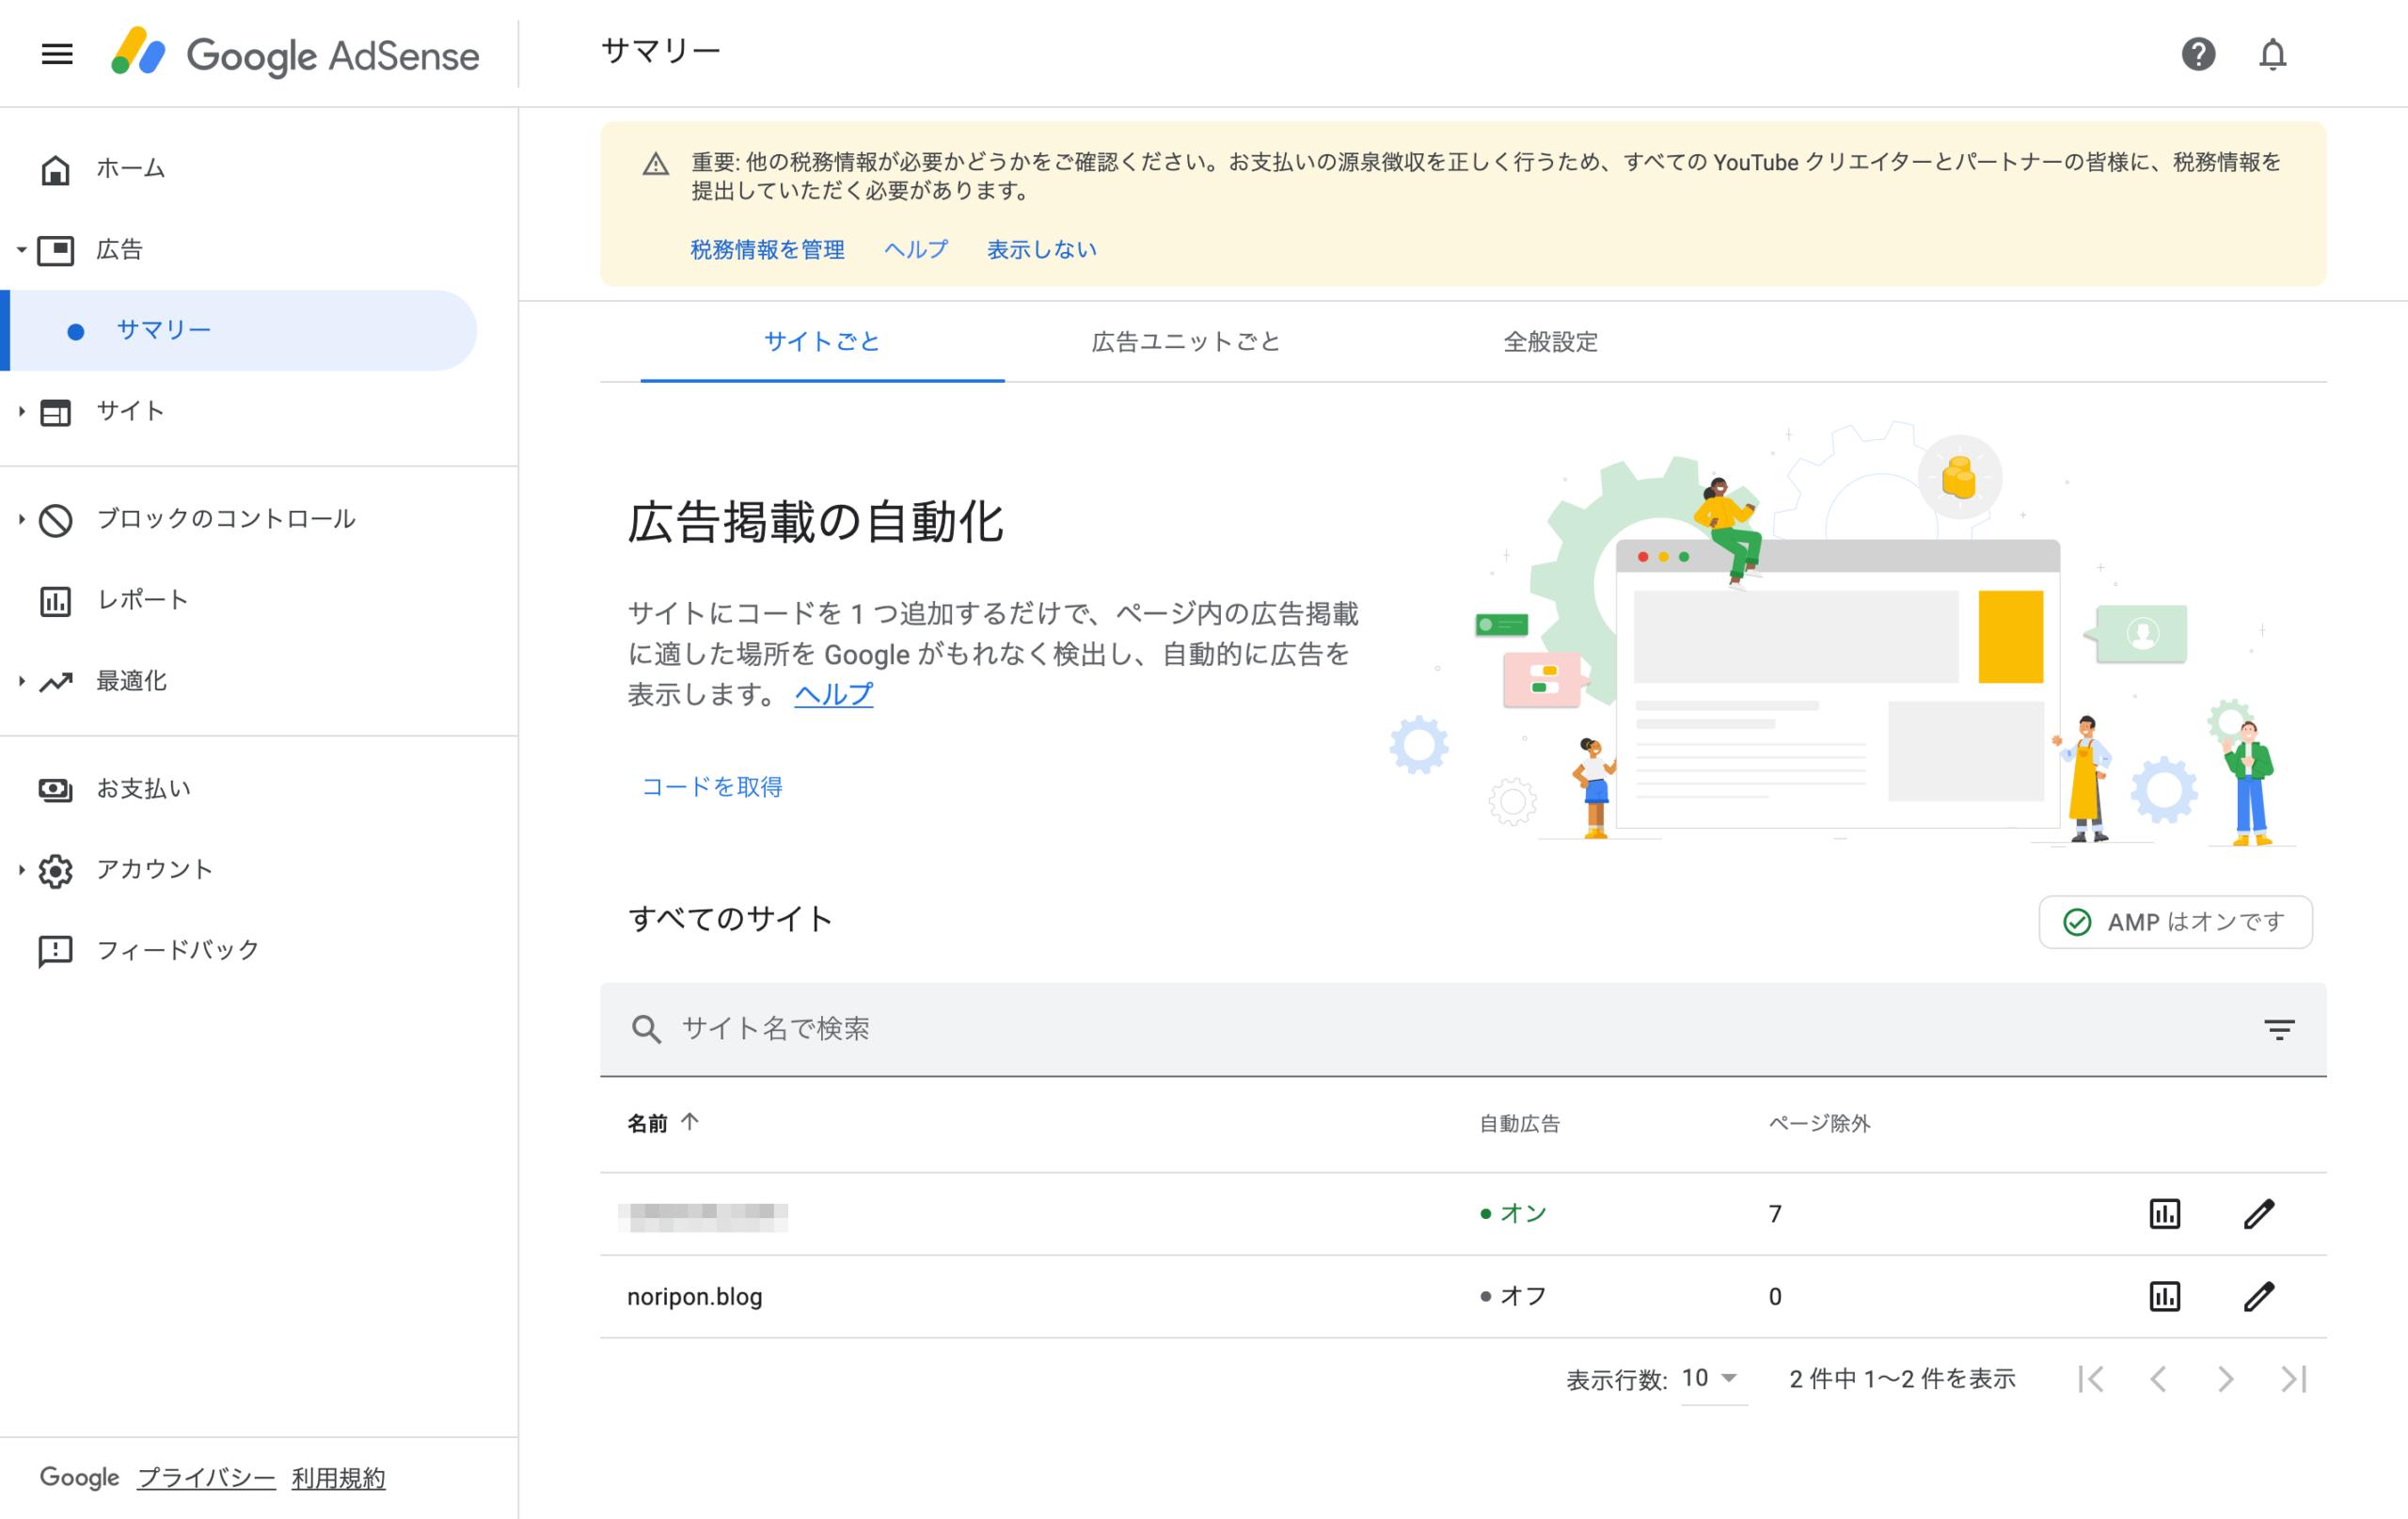 Google AdSense 税務情報の提出